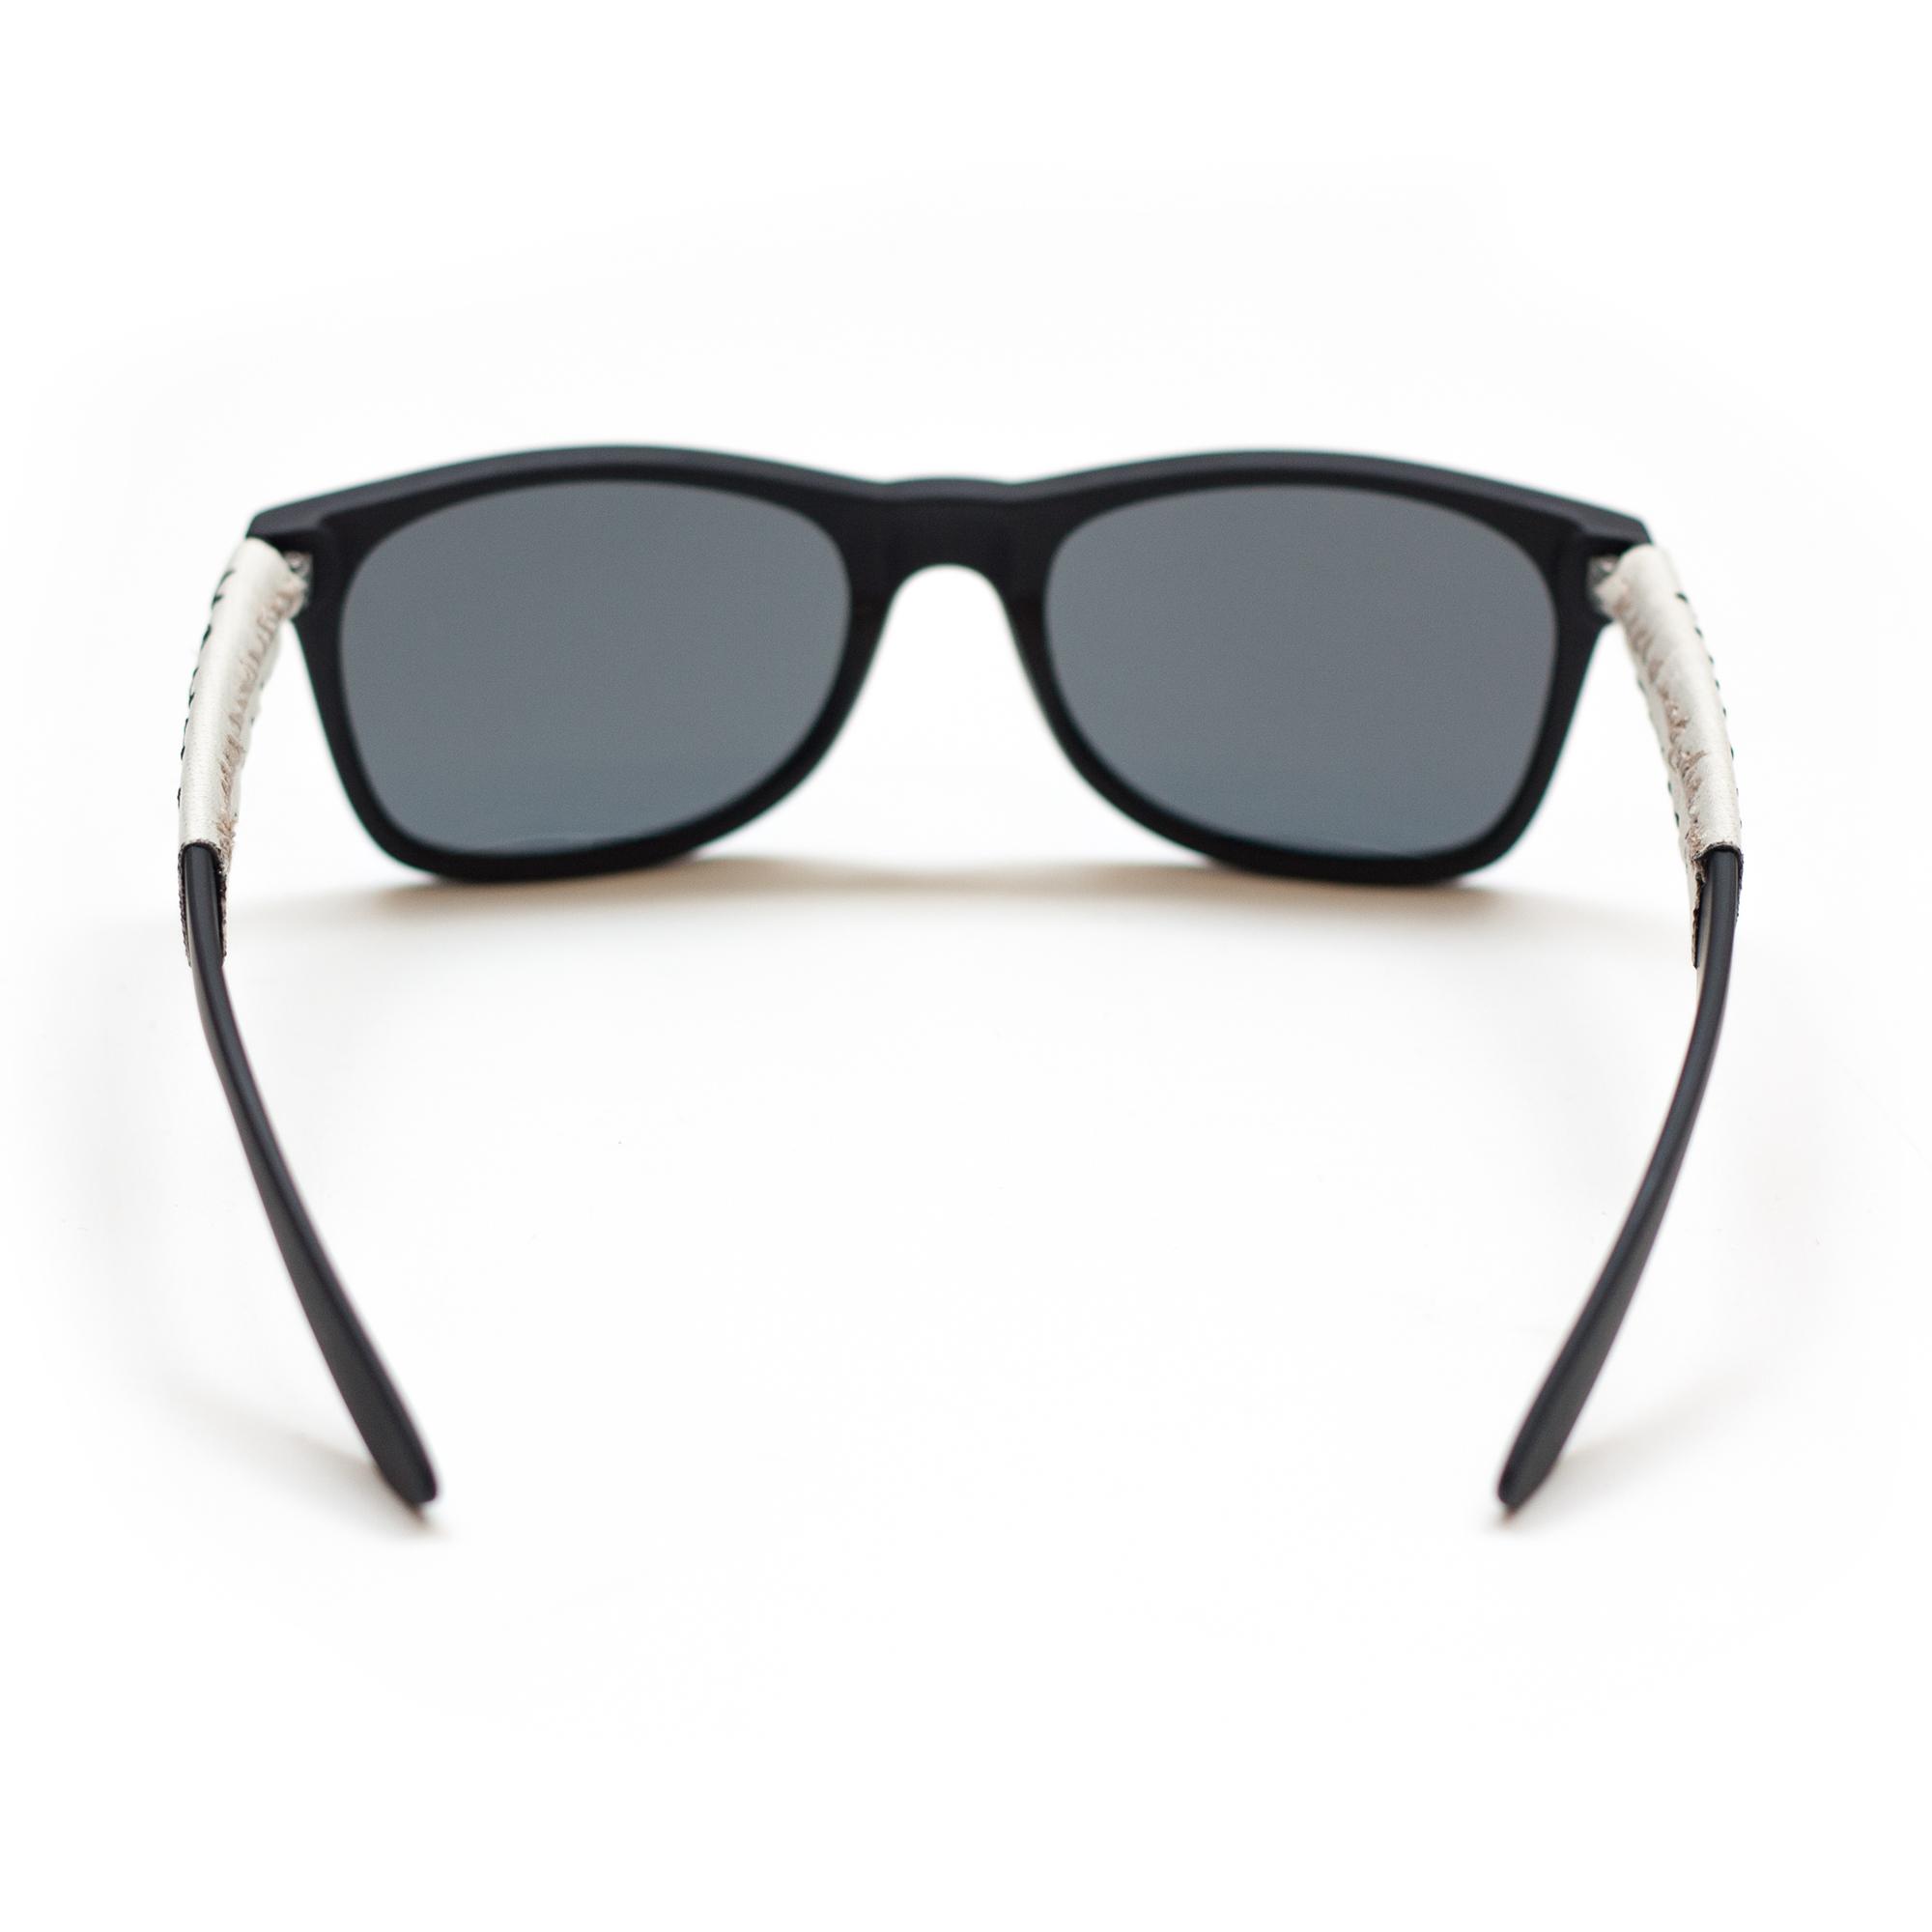 One Nature Sunglasses - 3